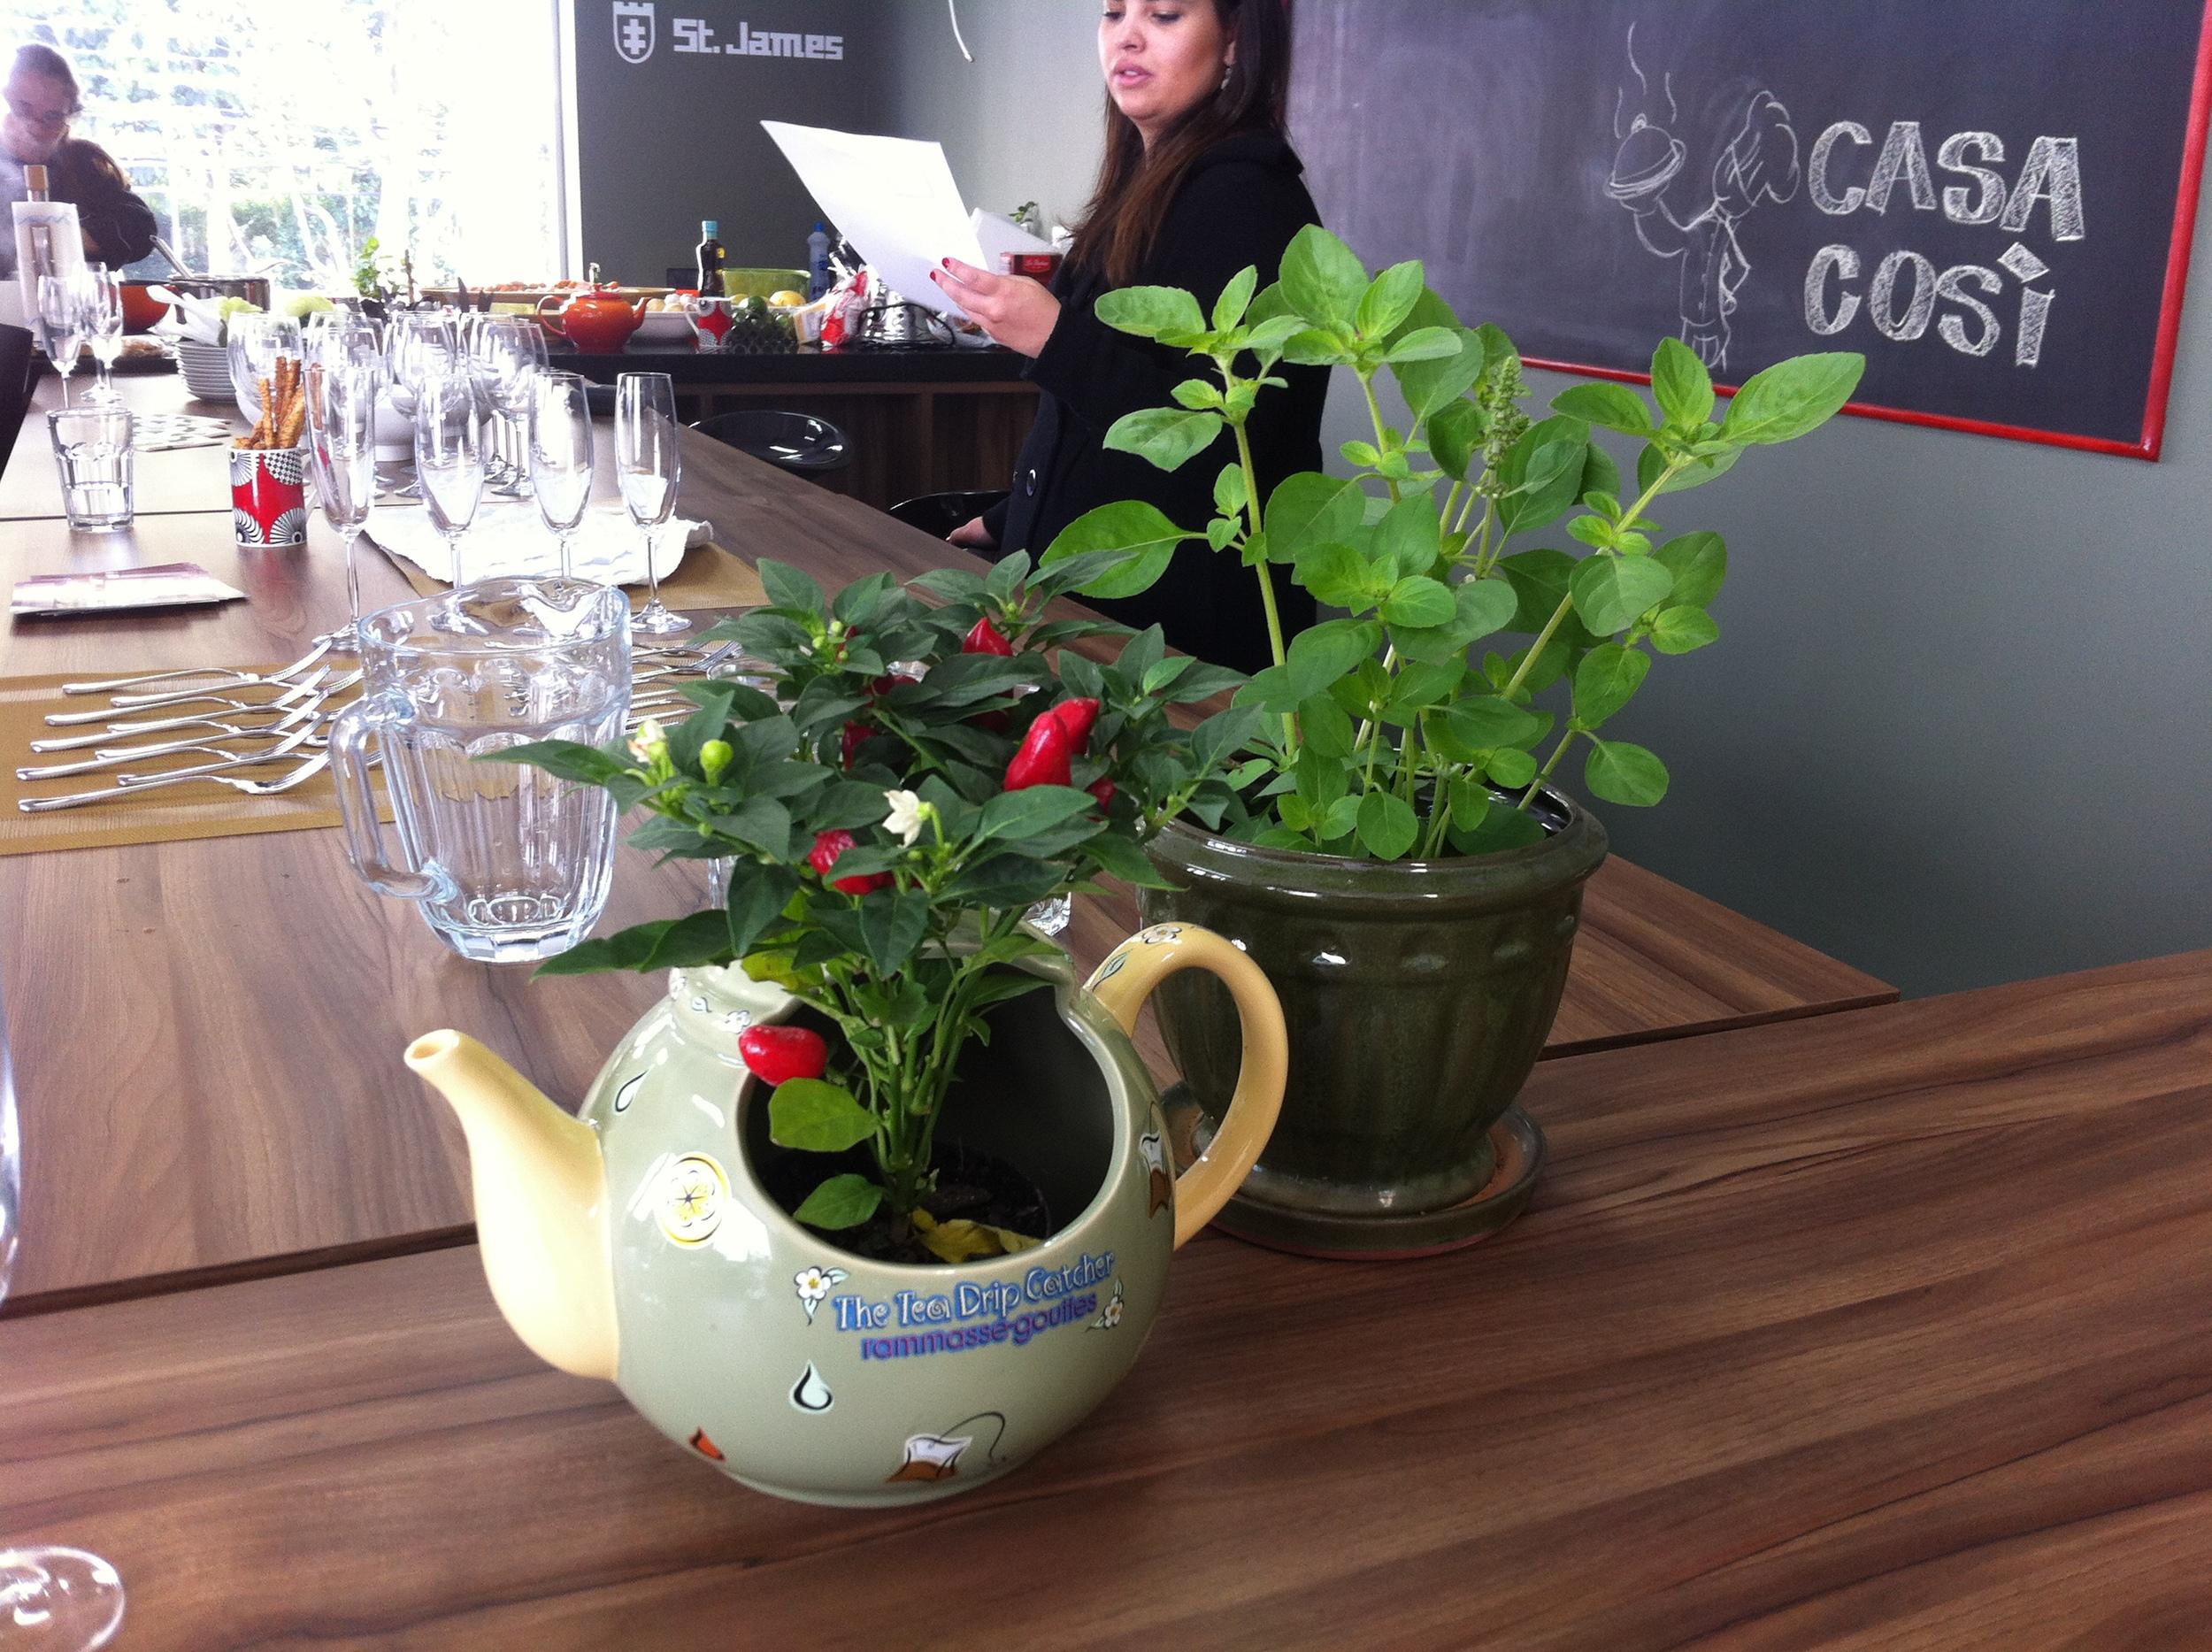 Temperos que decoram a mesa - Foto: Madi Arquitetura e Design